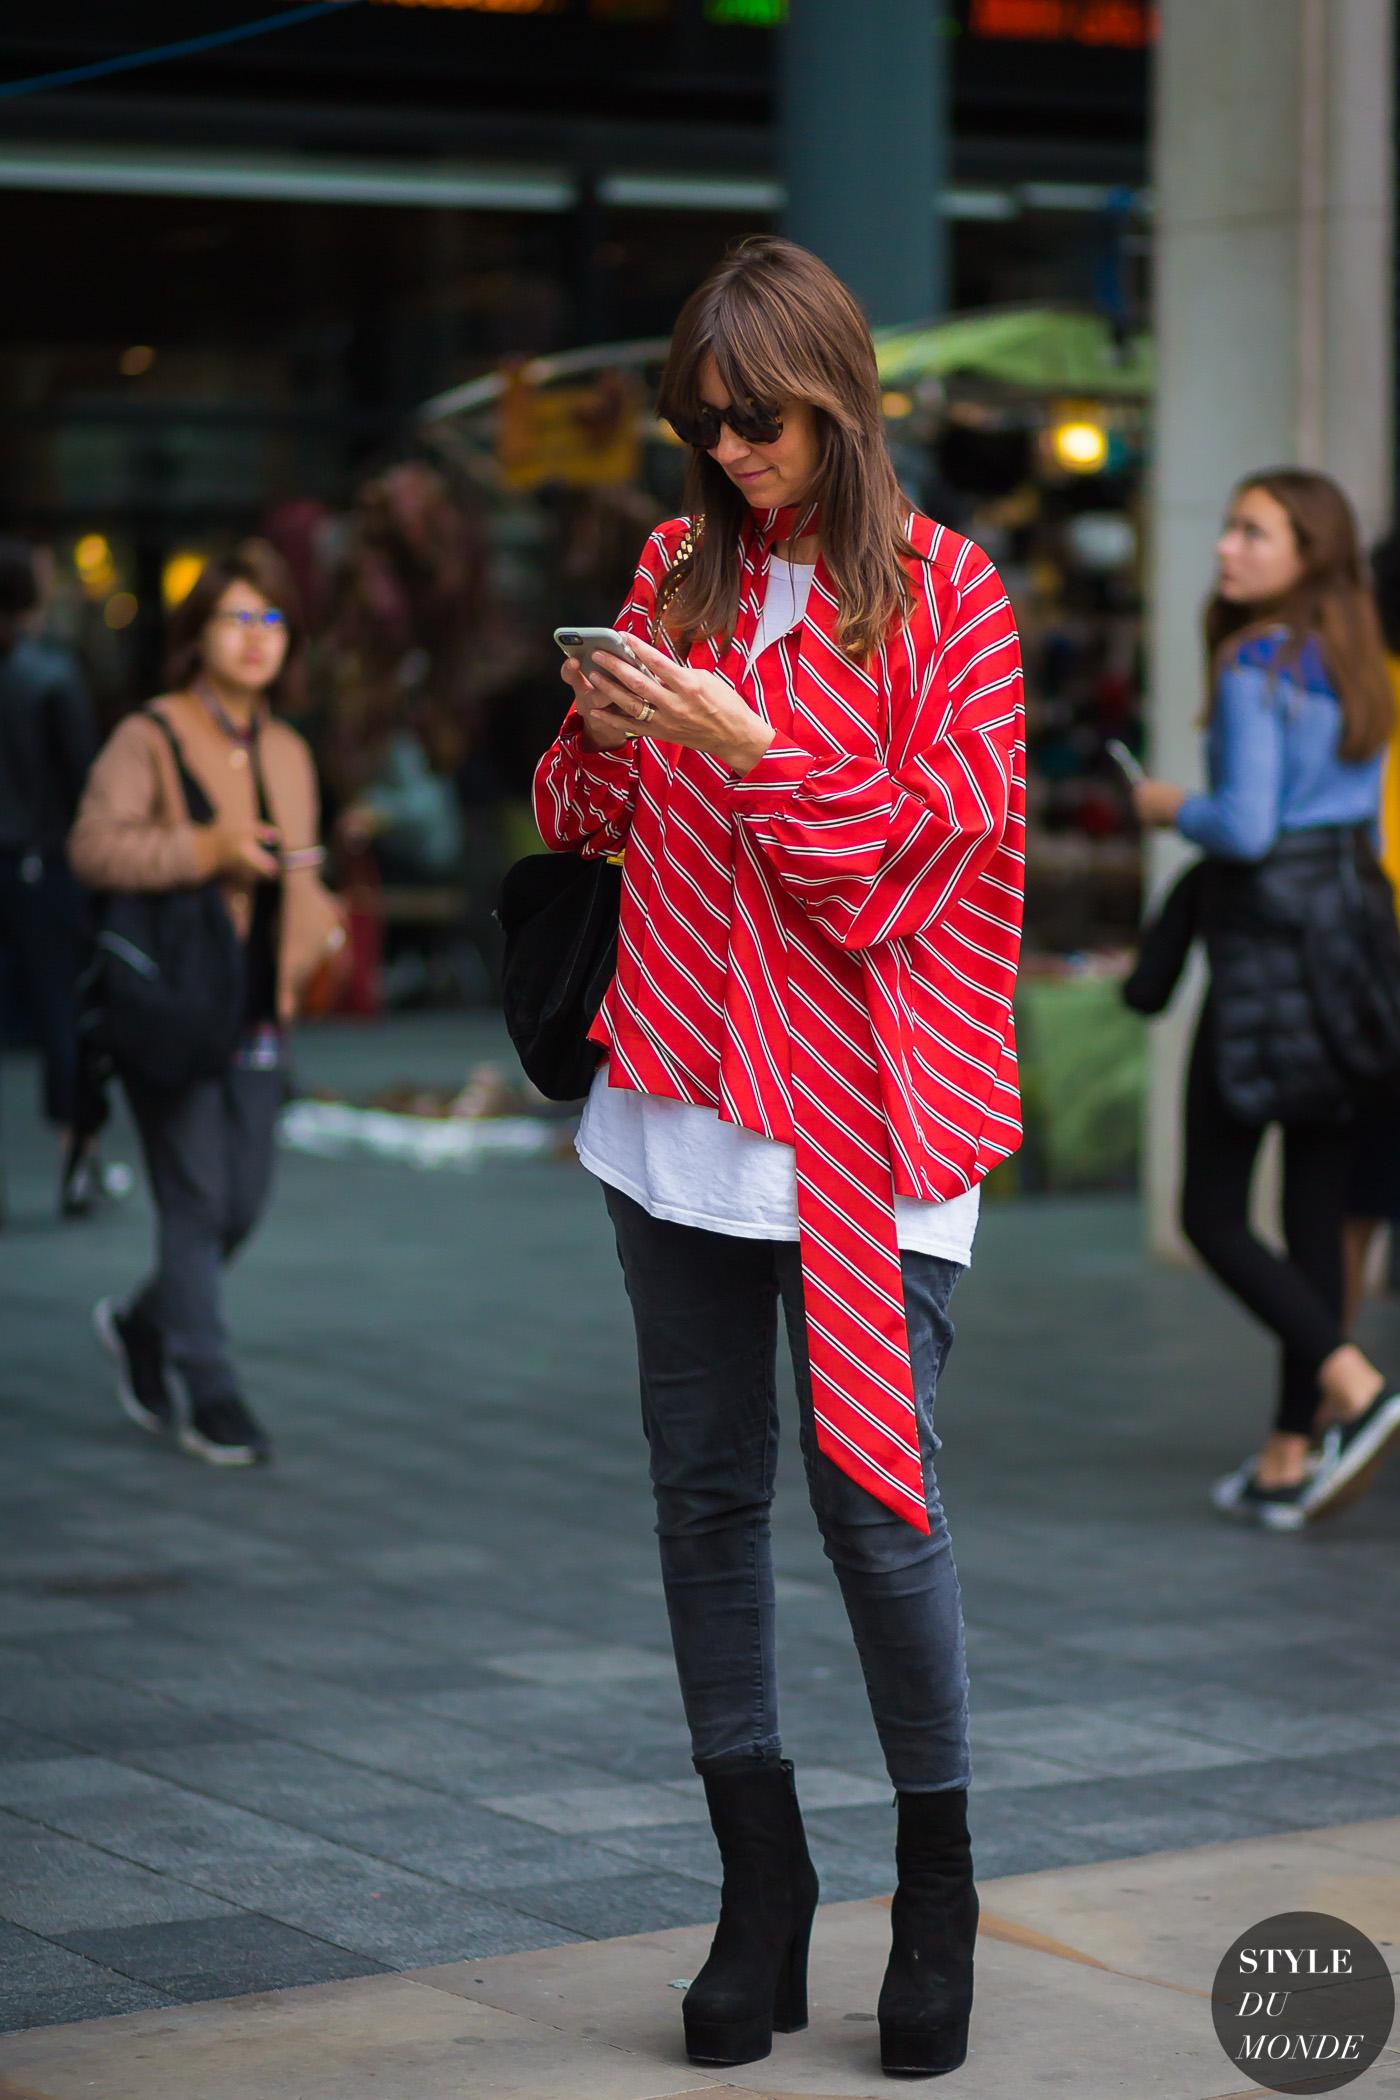 vanessa-coyle-by-styledumonde-street-style-fashion-photography